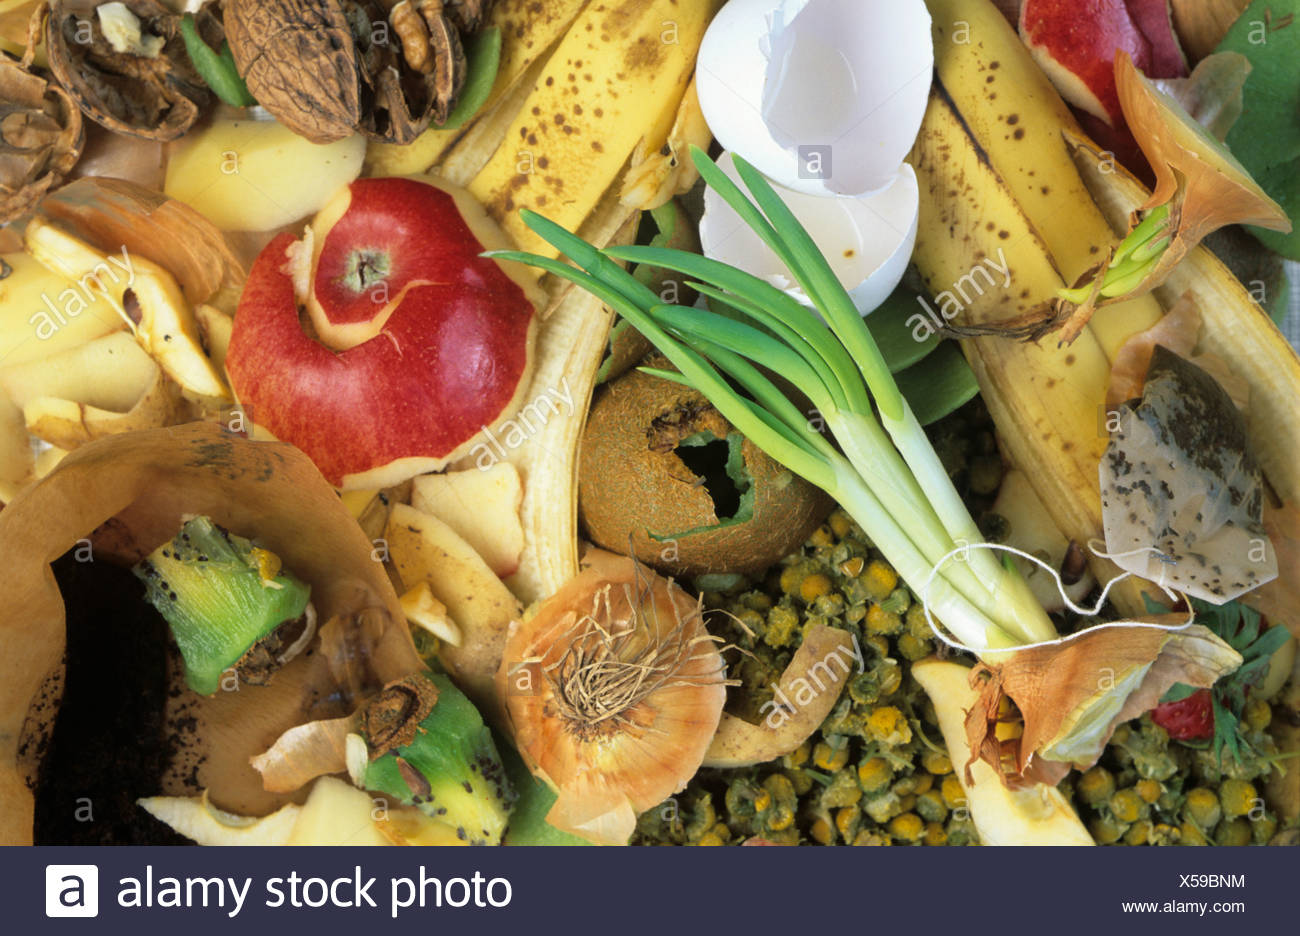 Organic kitchen waste, biodegradable - Stock Image